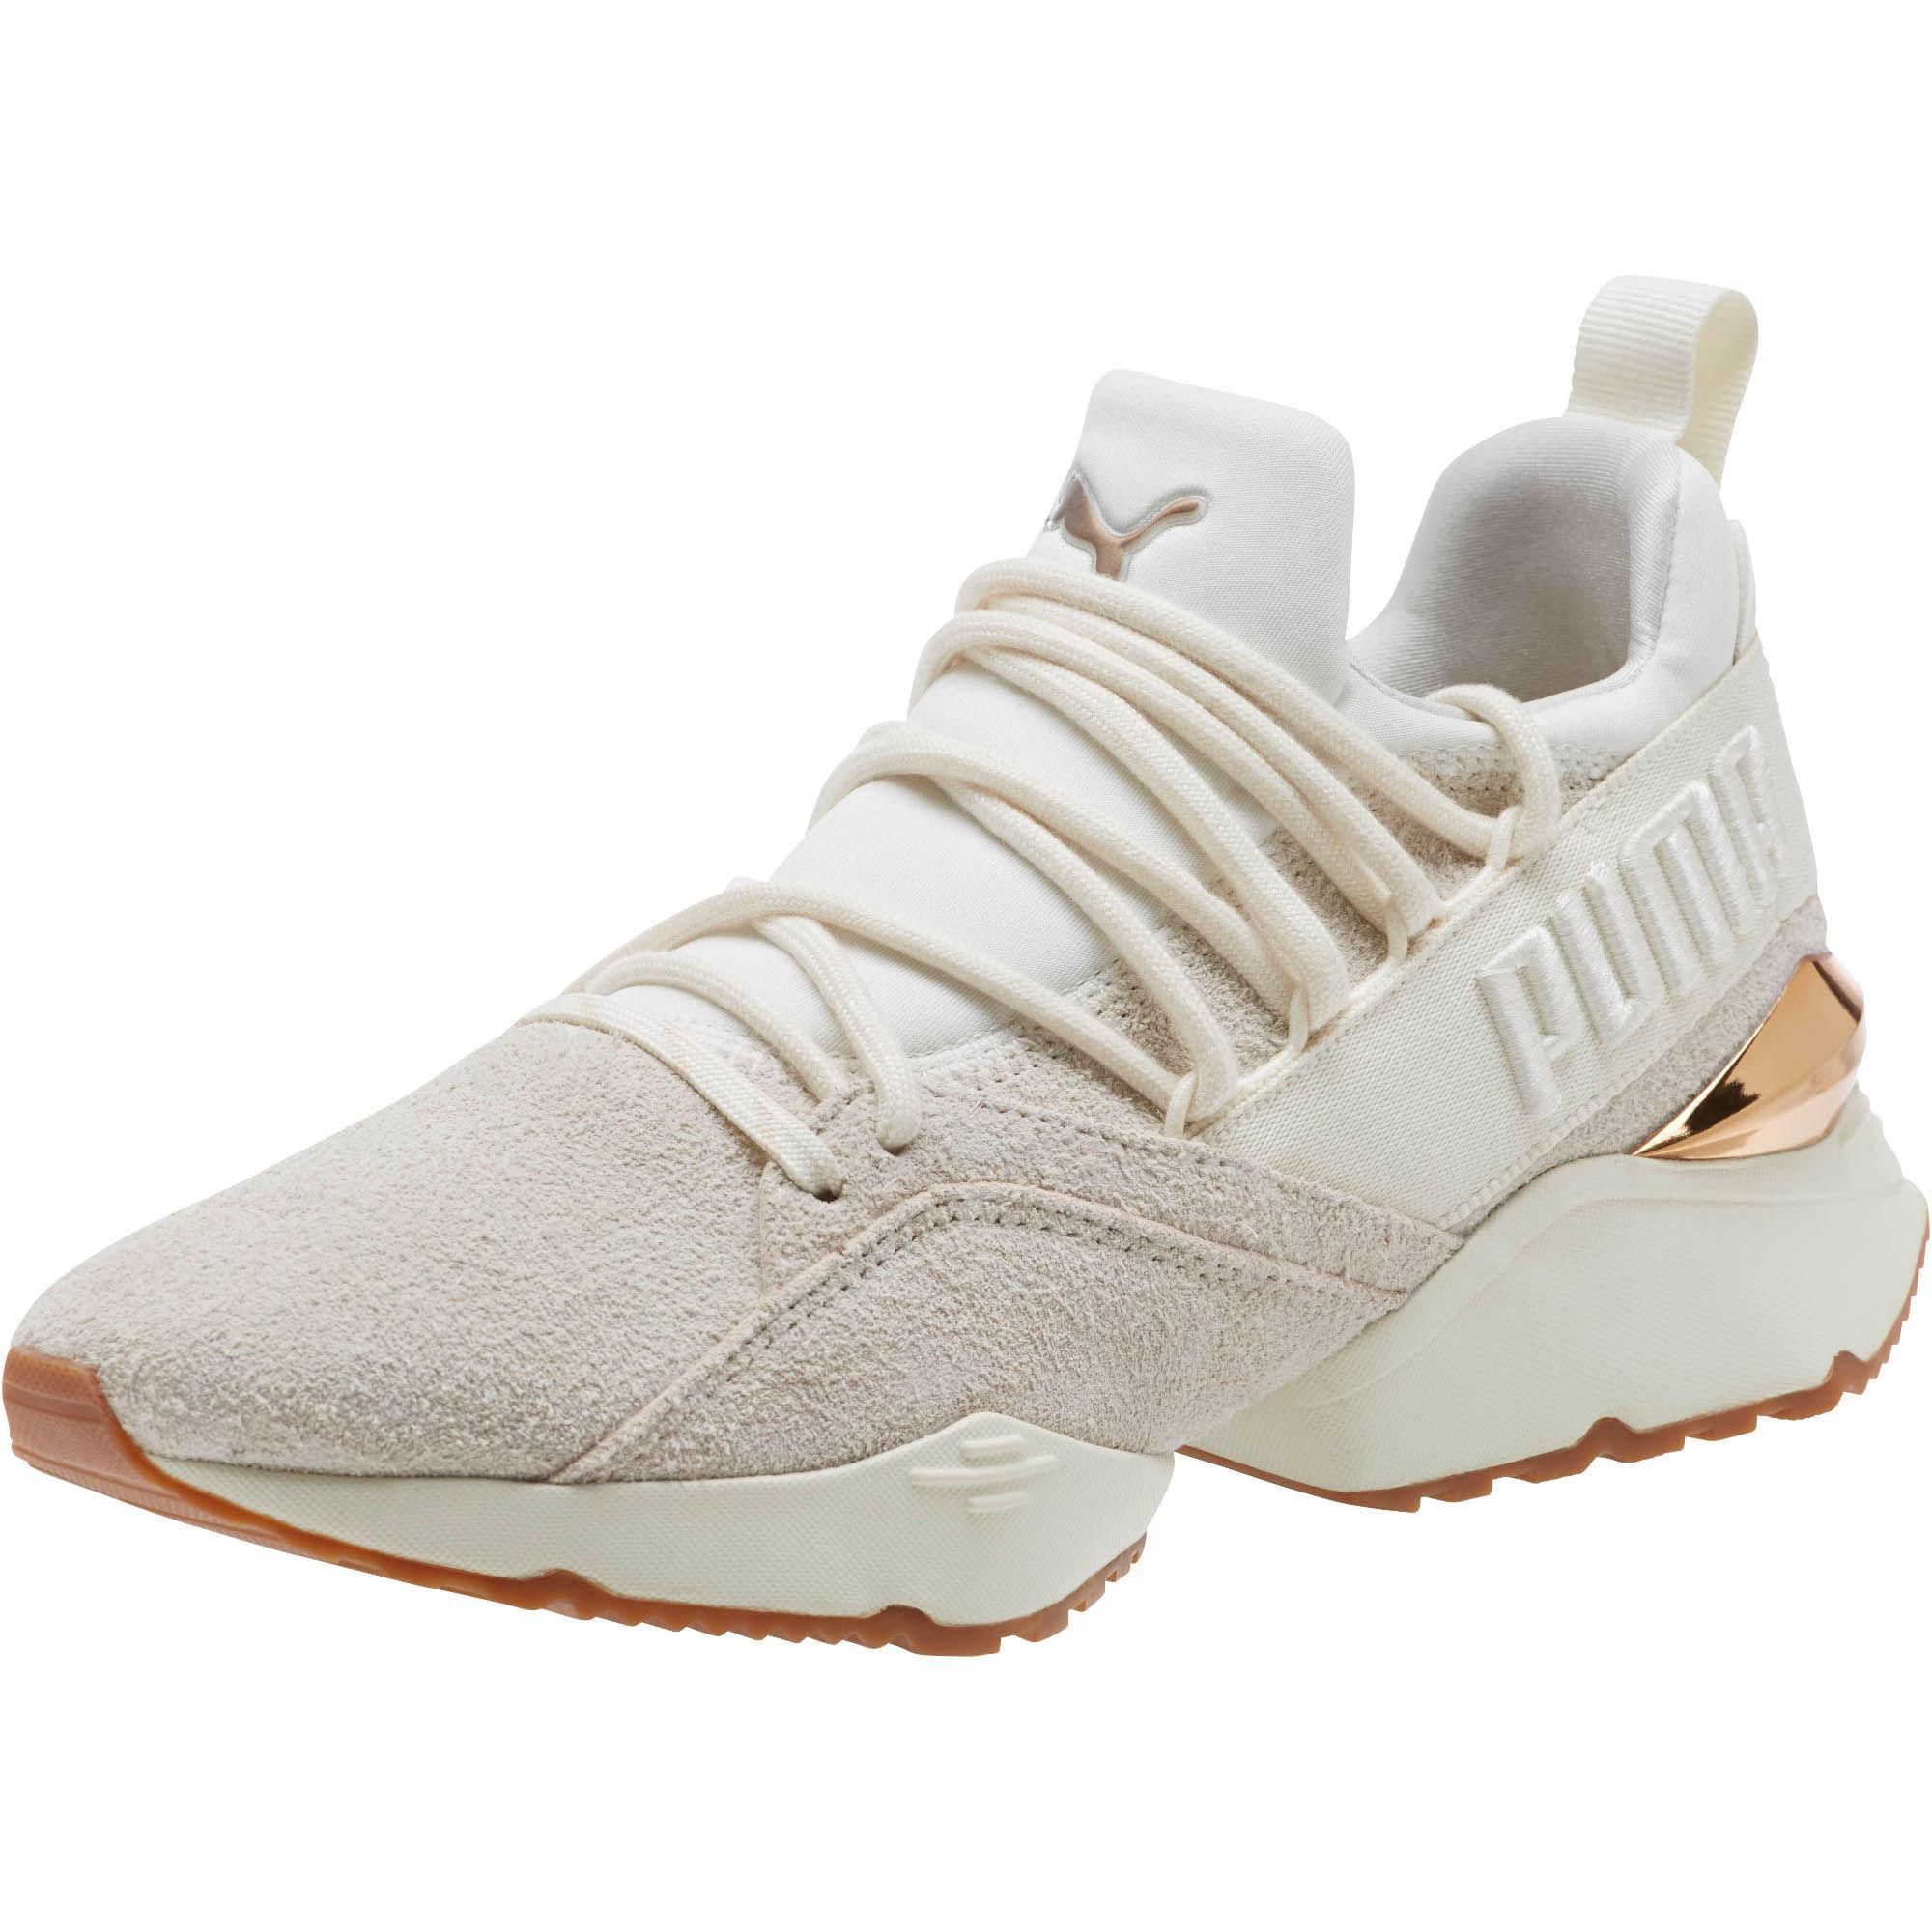 e406070aa6df94 Lyst - PUMA Muse Maia Util Women s Sneakers